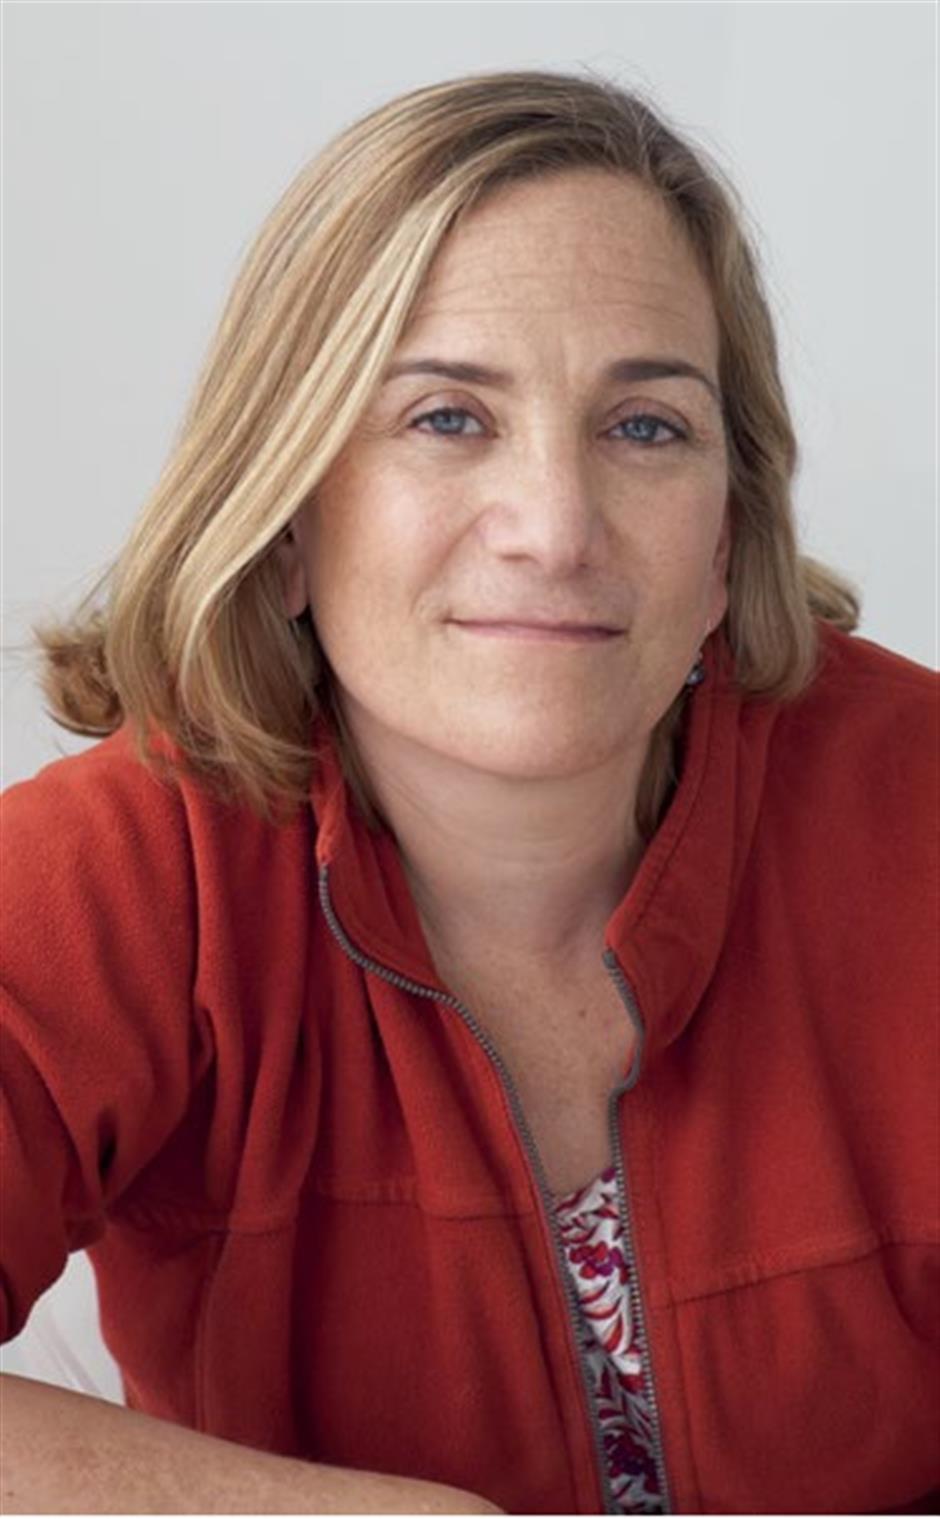 Tracy Chevalier